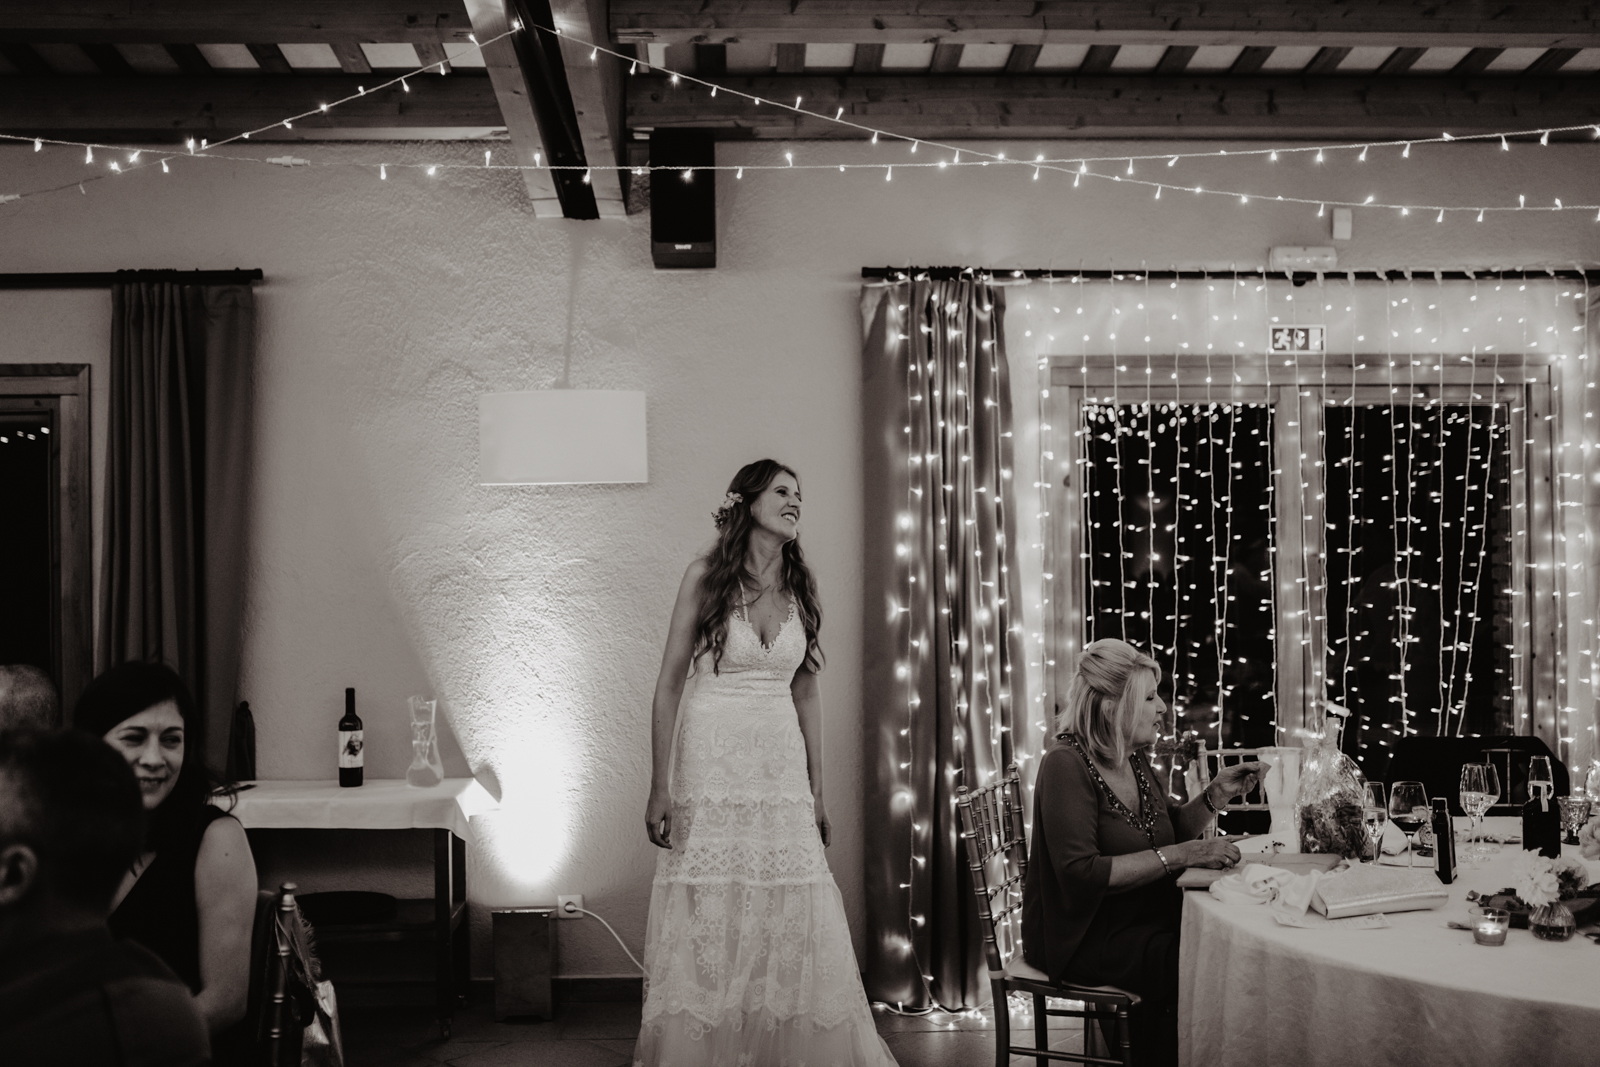 thenortherngirlphotography_photography_thenortherngirl_rebeccascabros_wedding_weddingphotography_weddingphotographer_barcelona_bodaenbarcelona_bodaenmaselmarti_bodarogeryvane-919.jpg